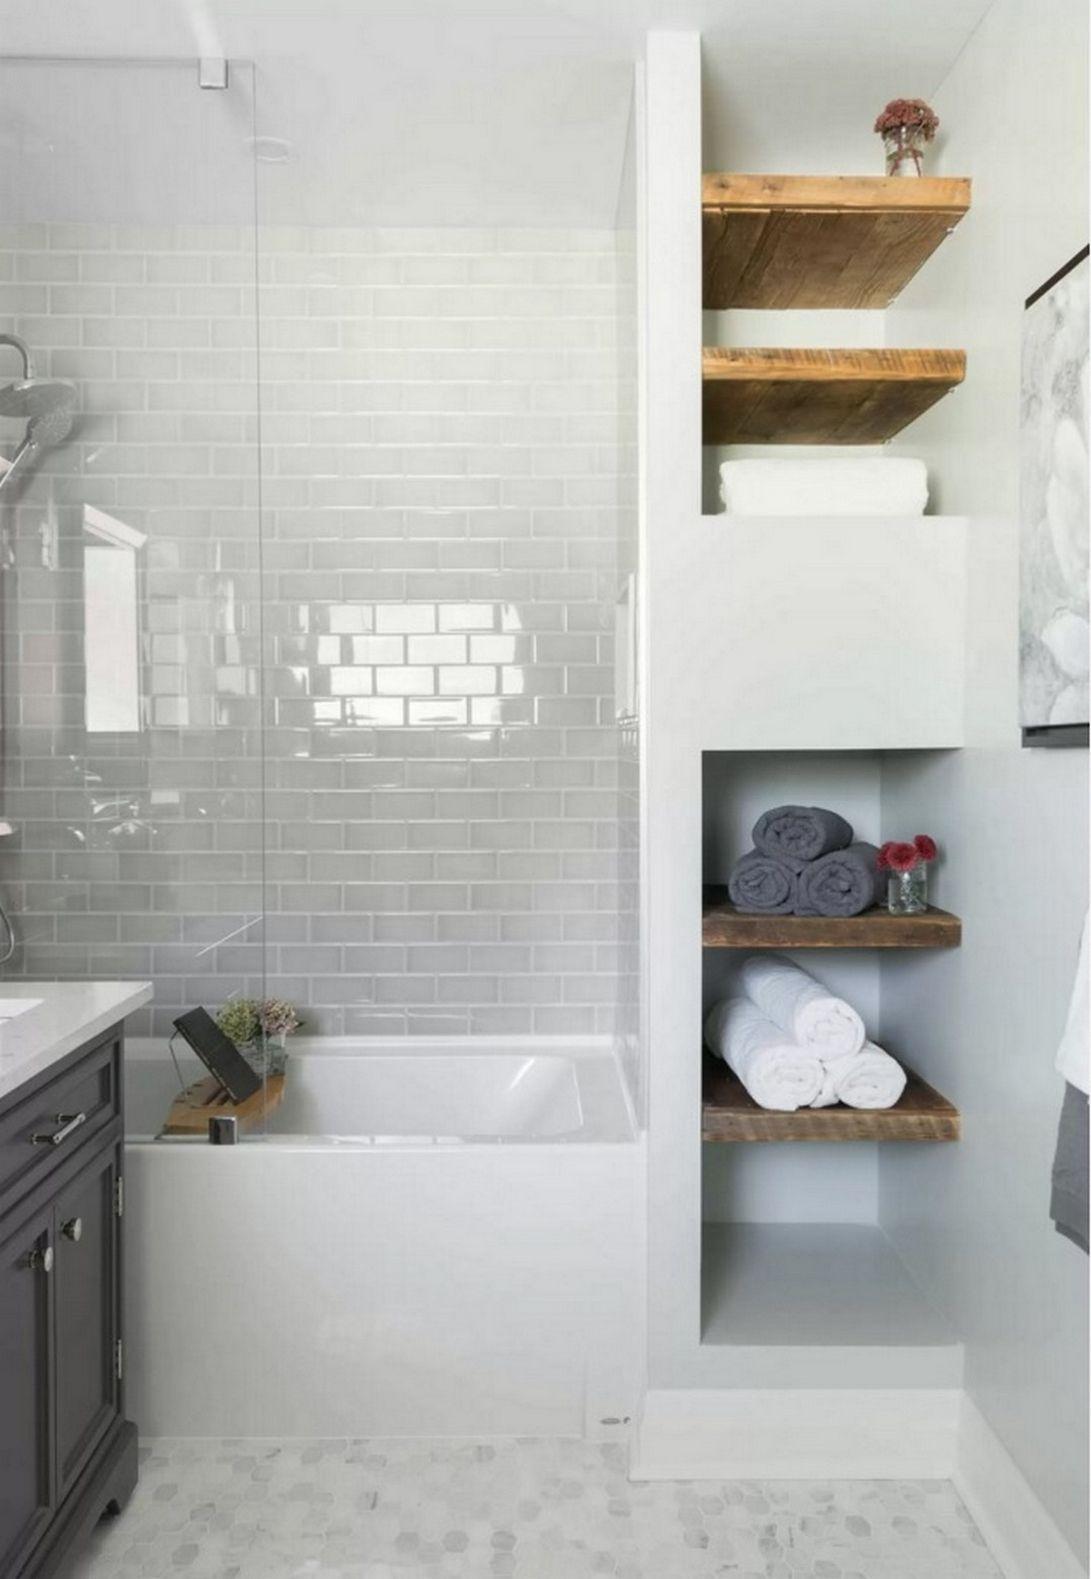 Best 100 Bathroom Design & Remodeling Ideas on a Budget   Pinterest ...